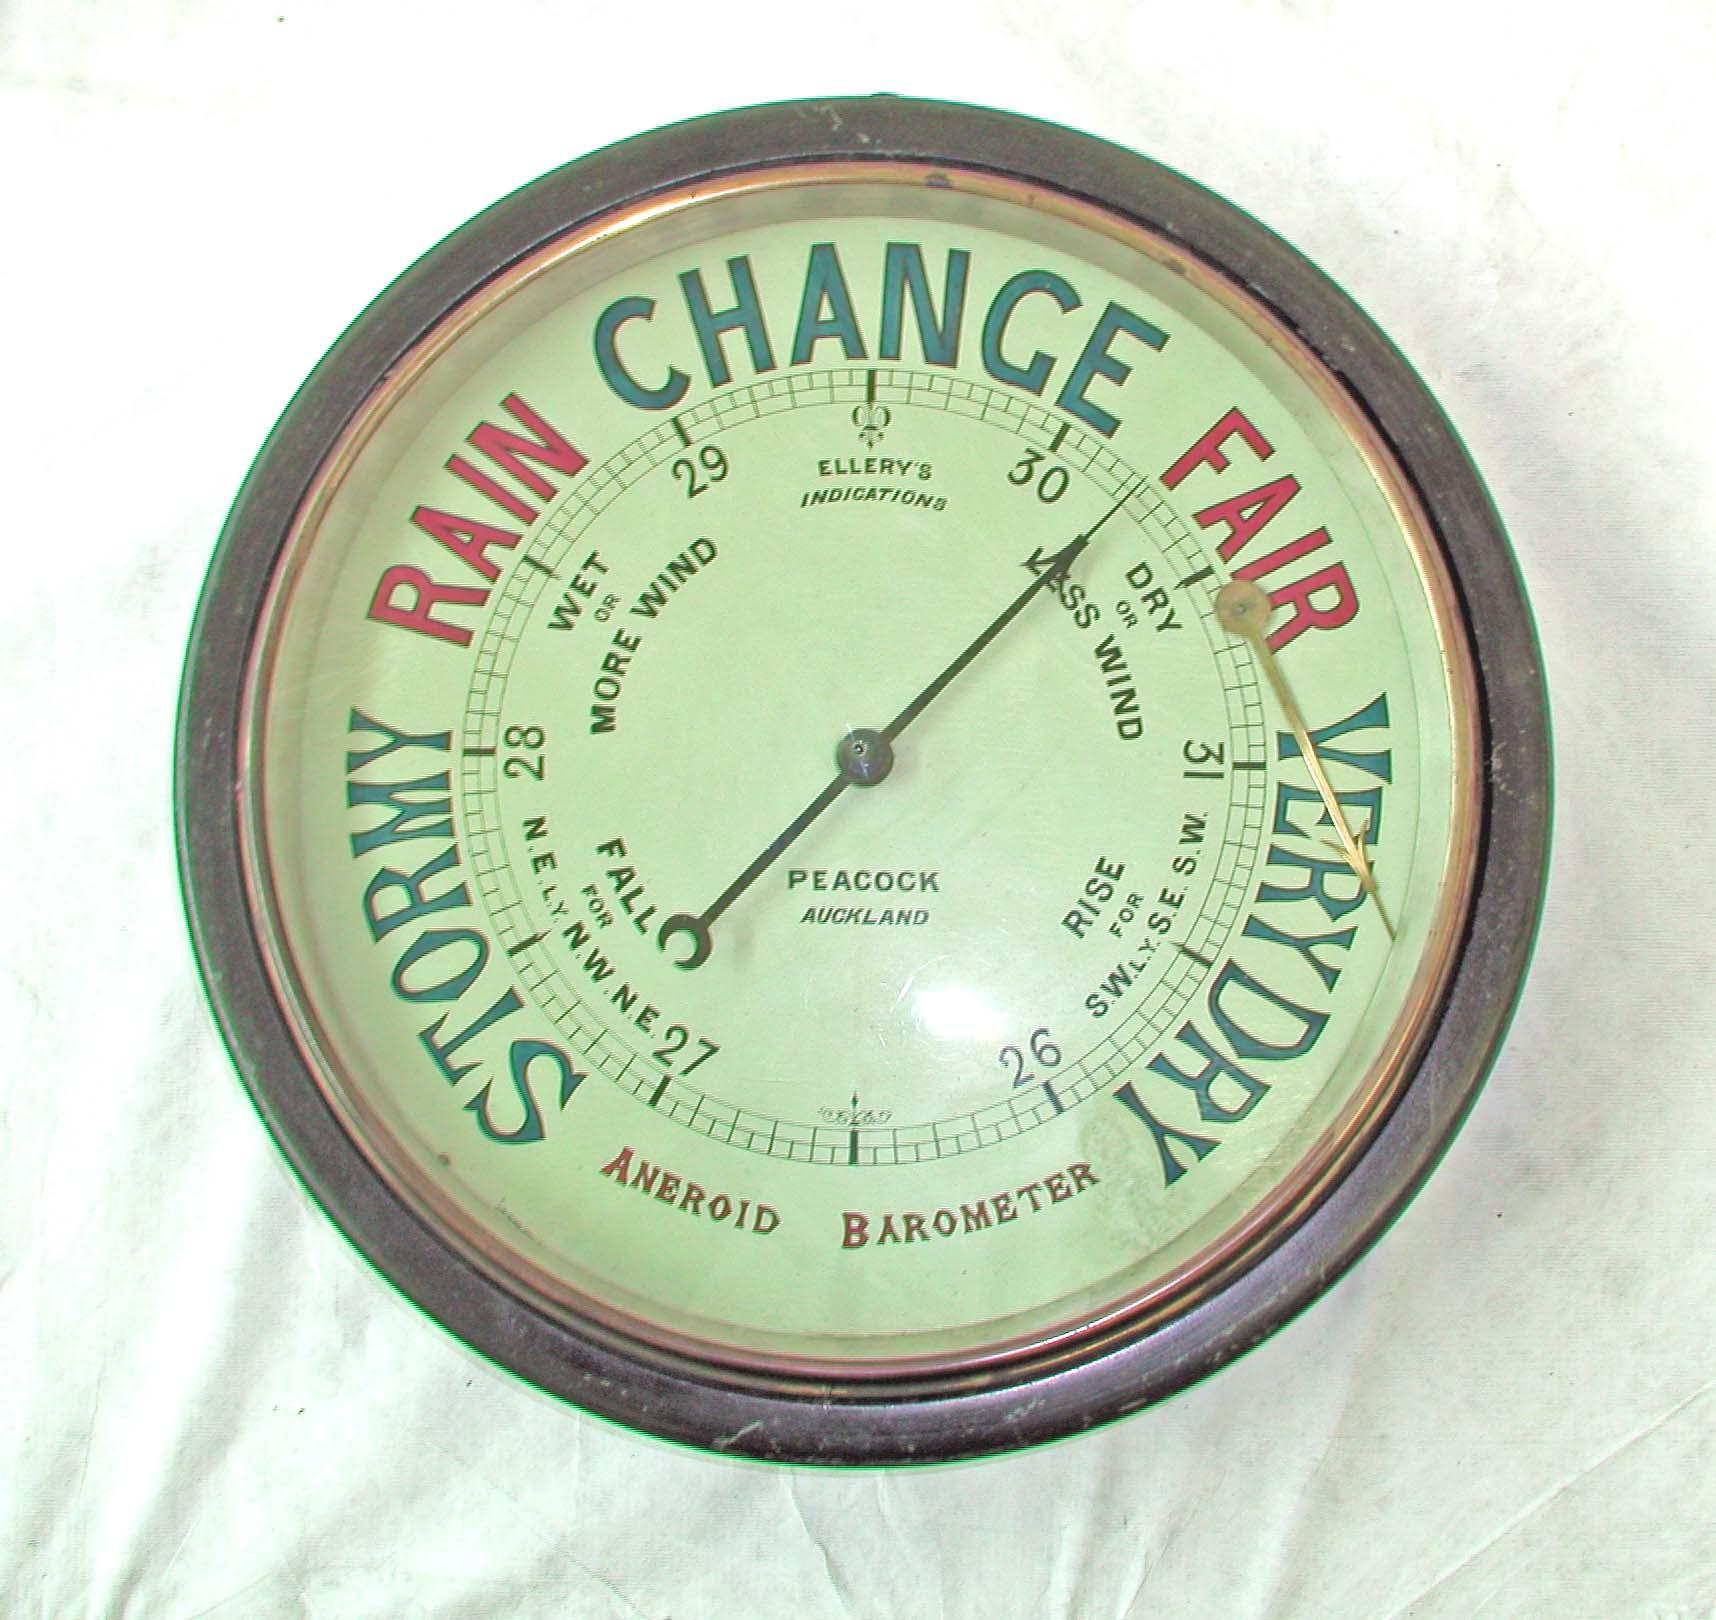 File:Barometer, Aneroid (AM 70061-7).jpg